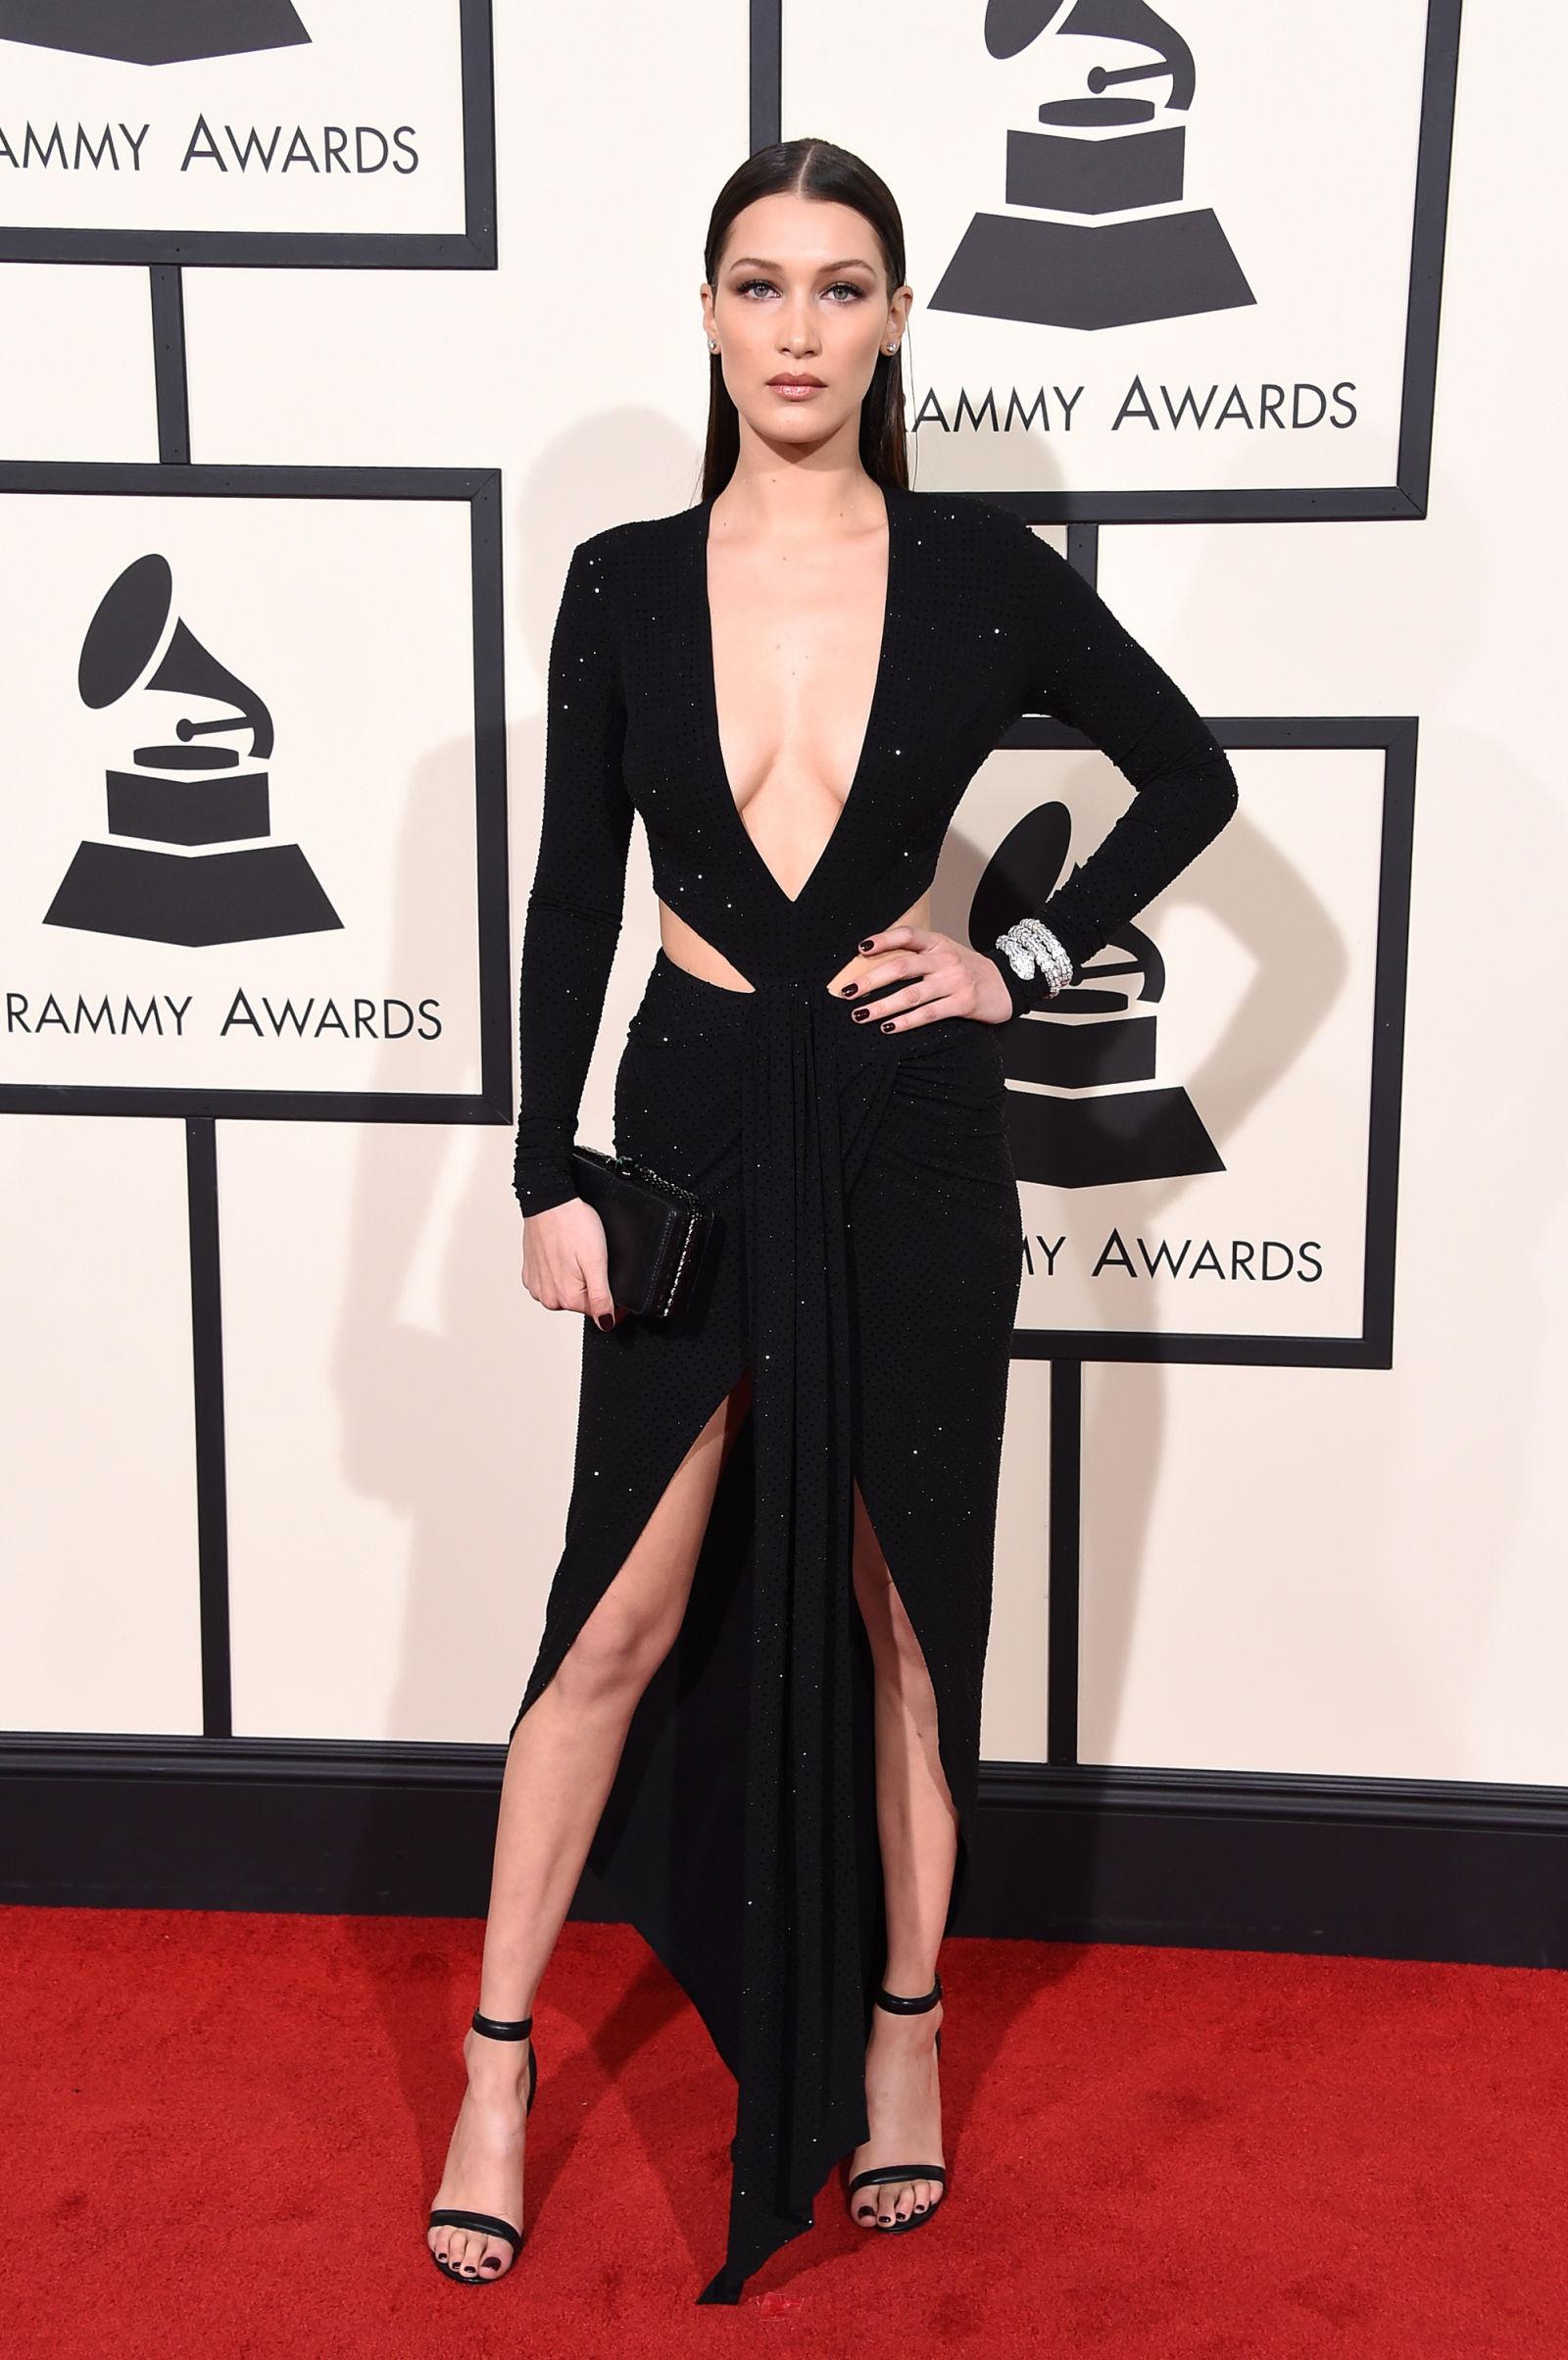 BELLA HADID celebrity hairstyles 2016 Grammys